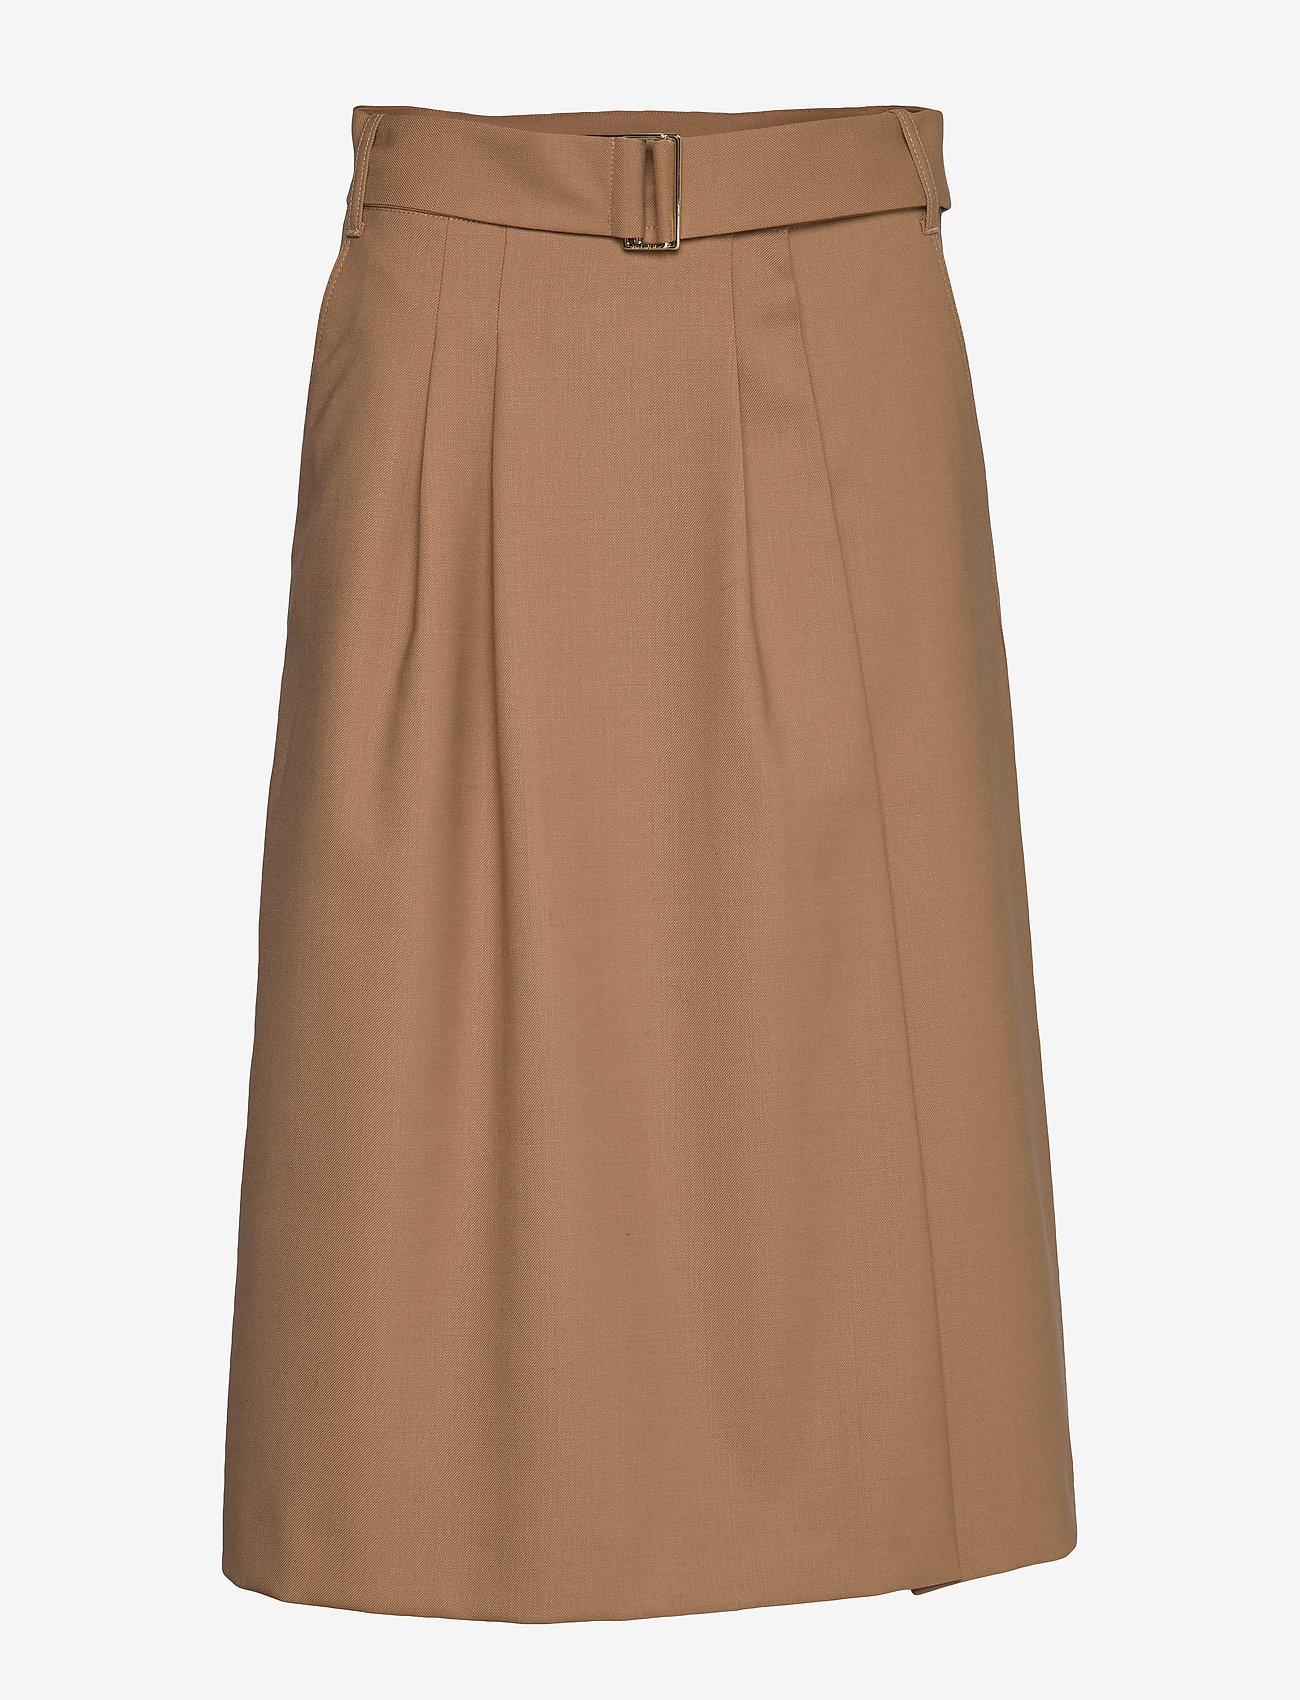 Hilfiger Collection - HCW CHINO SKIRT - midi skirts - cornstalk - 0